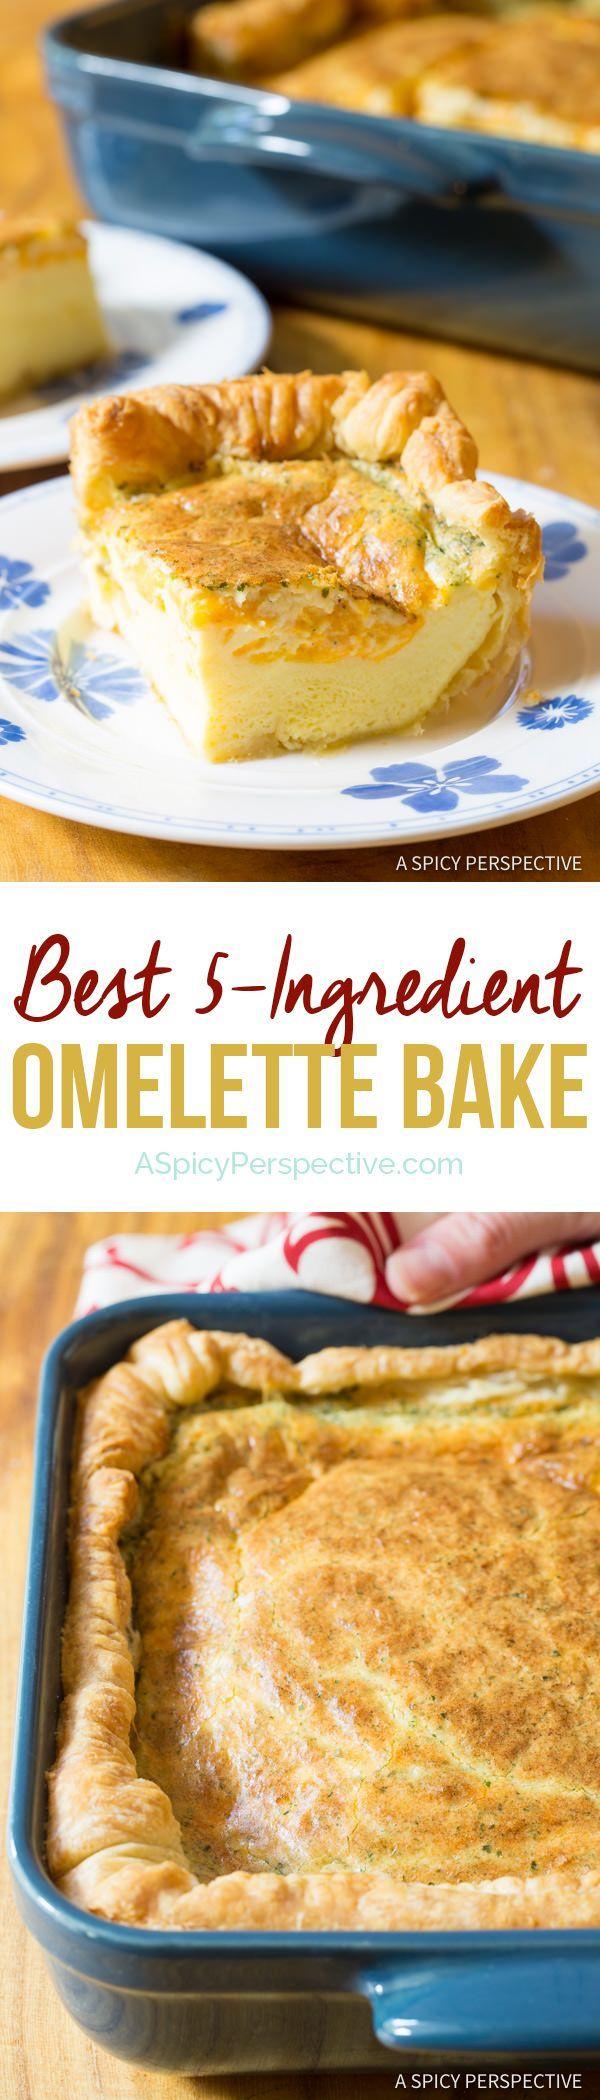 Fluffy 5-Ingredient Omelette Bake #holiday #christmas #easter #FreshHolidayTips #Hidden Valley @Glad @Walmart